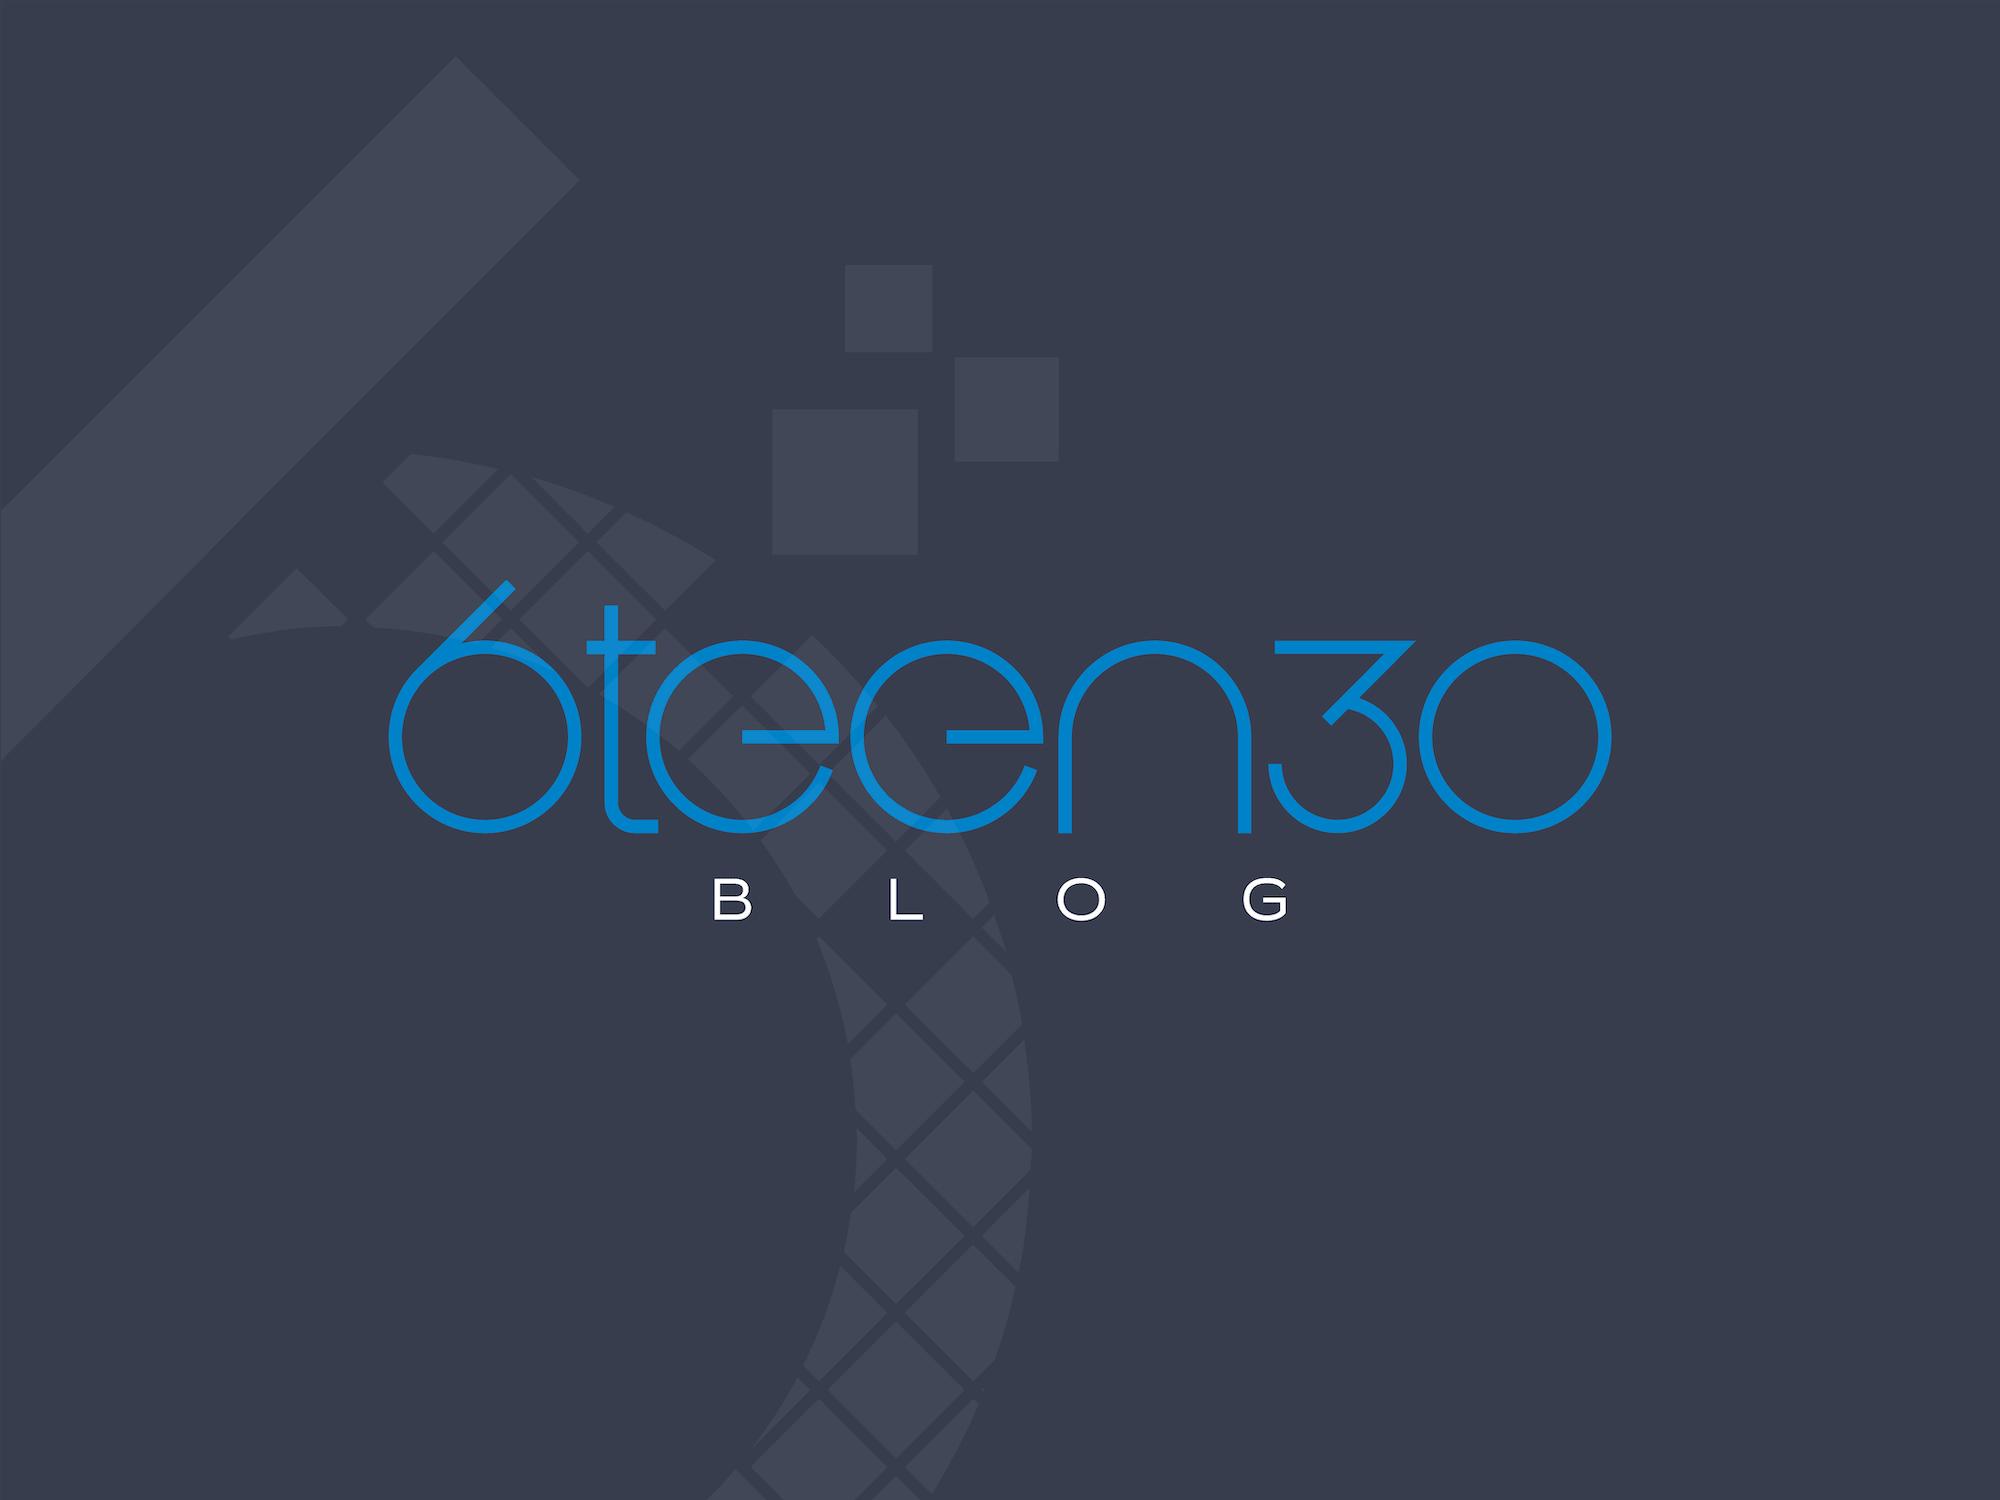 6teen30 - Growth Agency - Blog